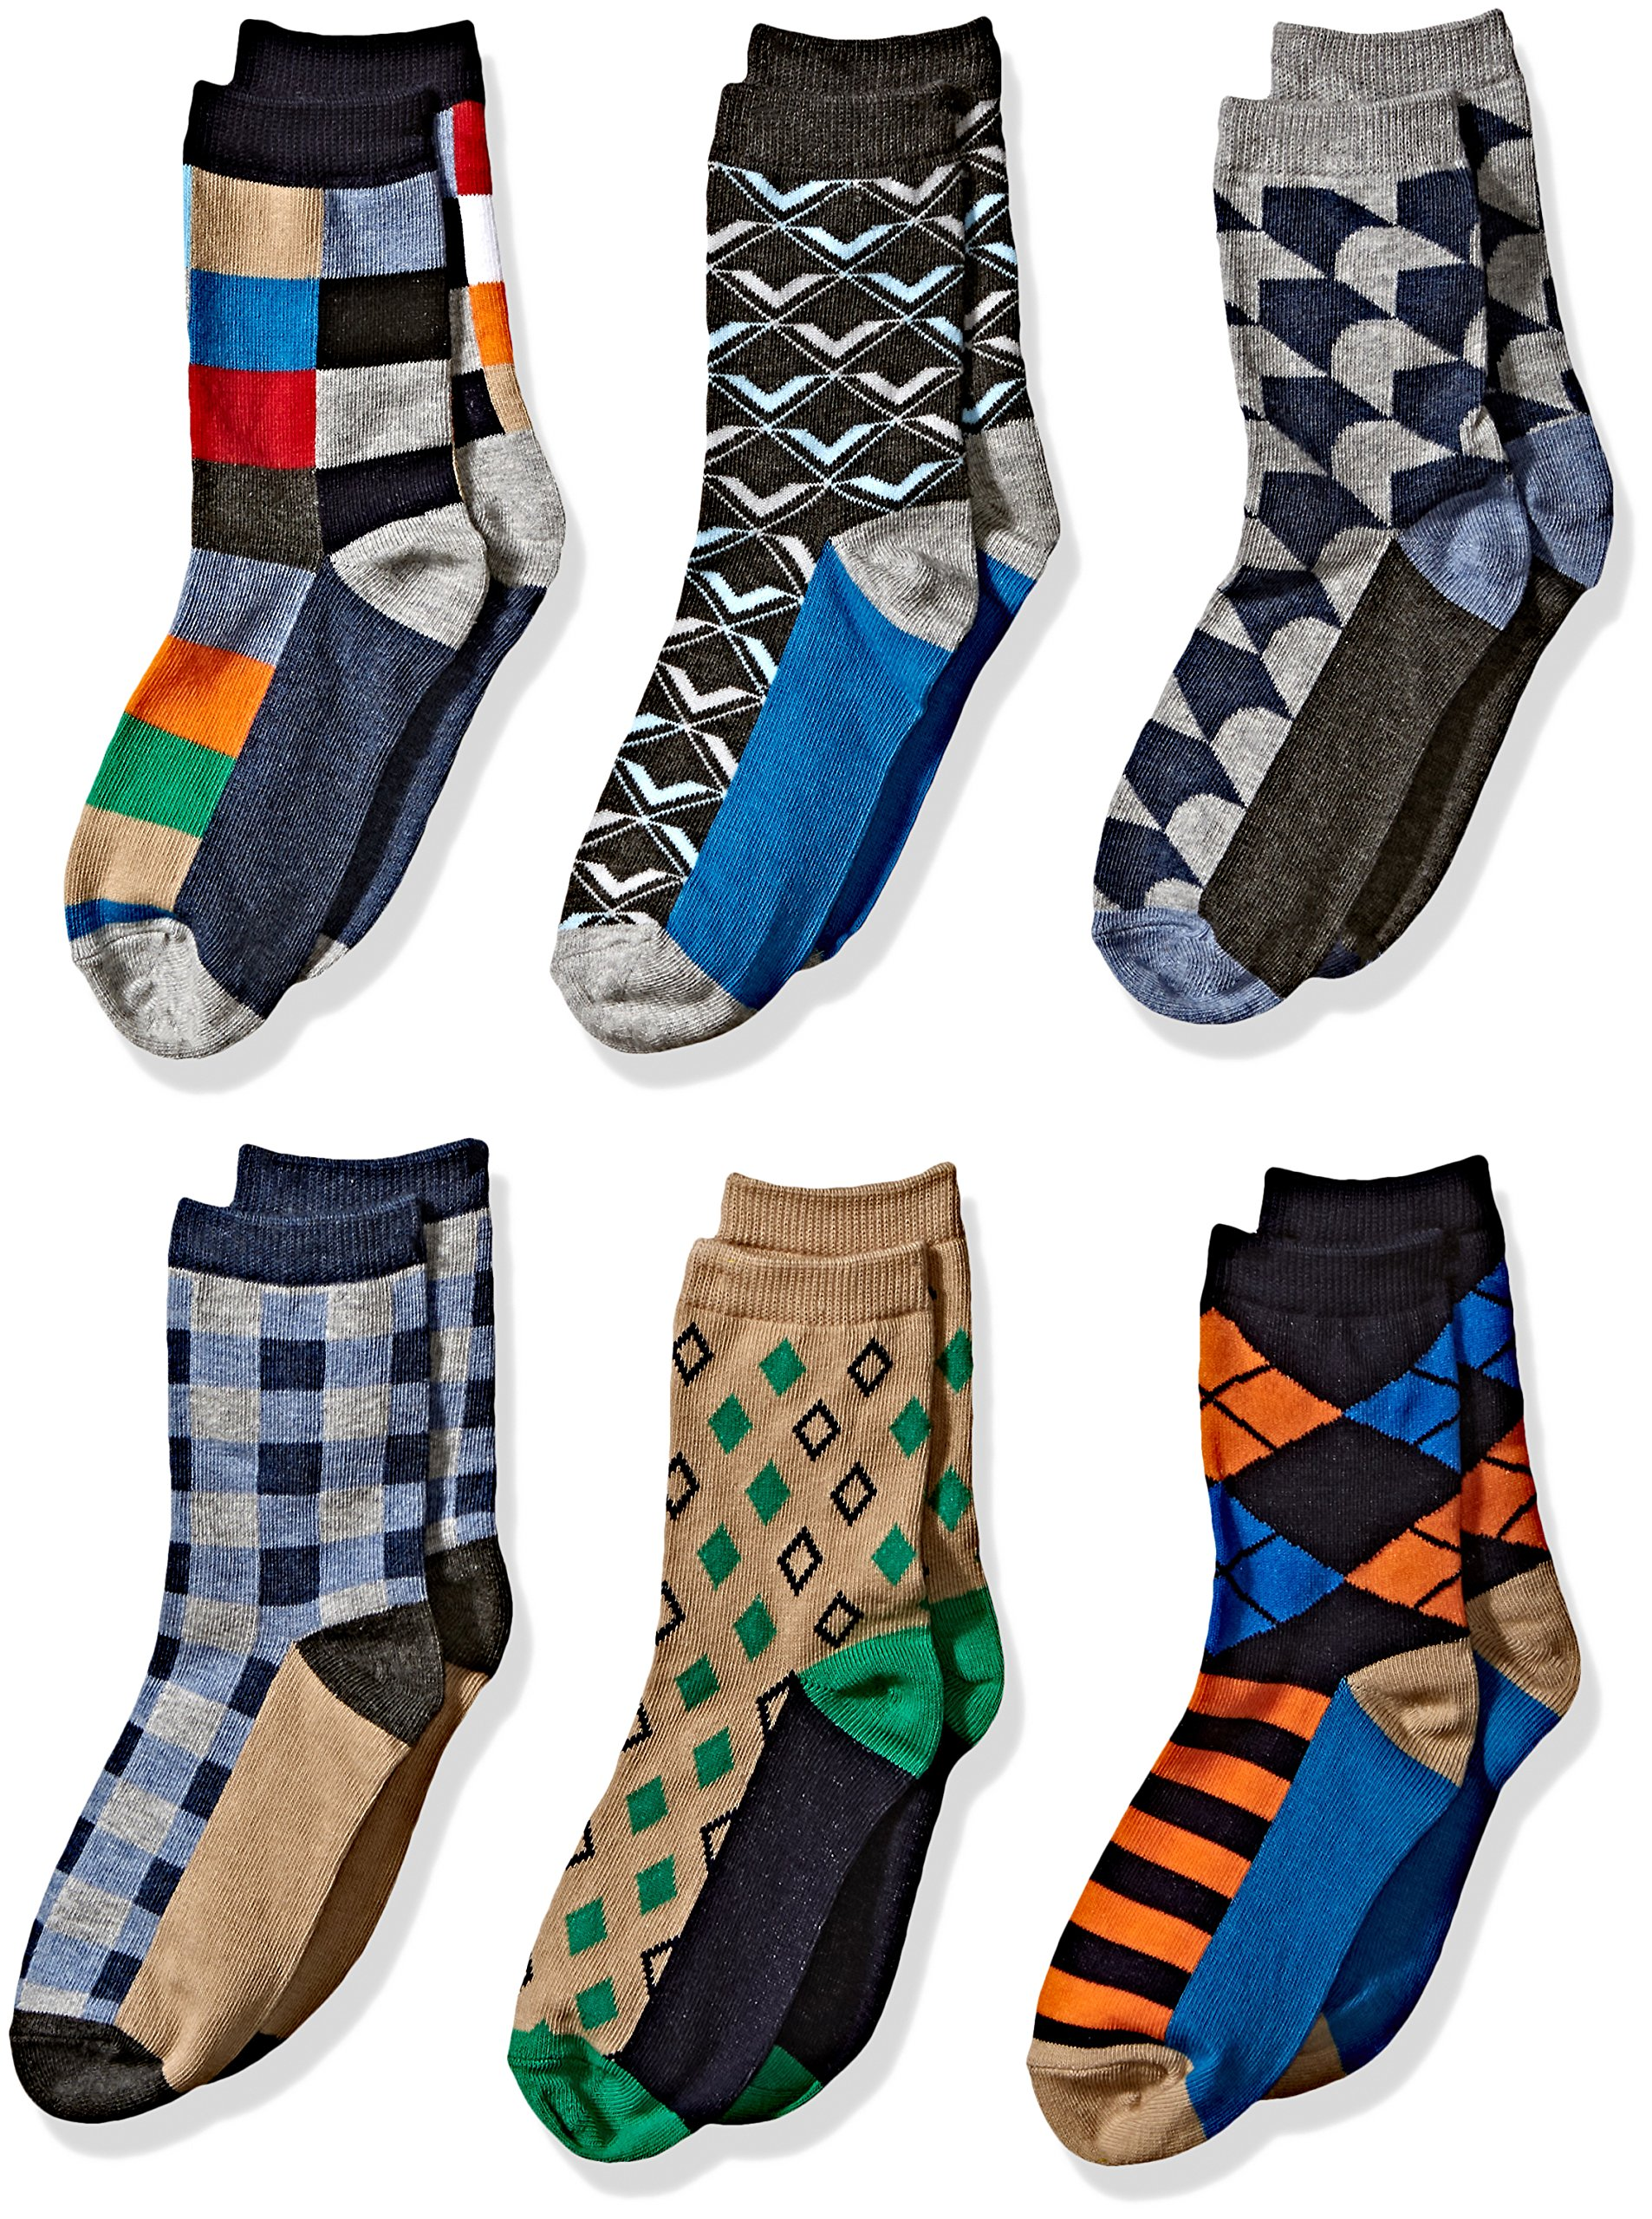 e99c2a15ac28a Get Quotations · Jefferies Socks Little Boys' Fun Colorful Dress Crew Socks  6 Pair Pack